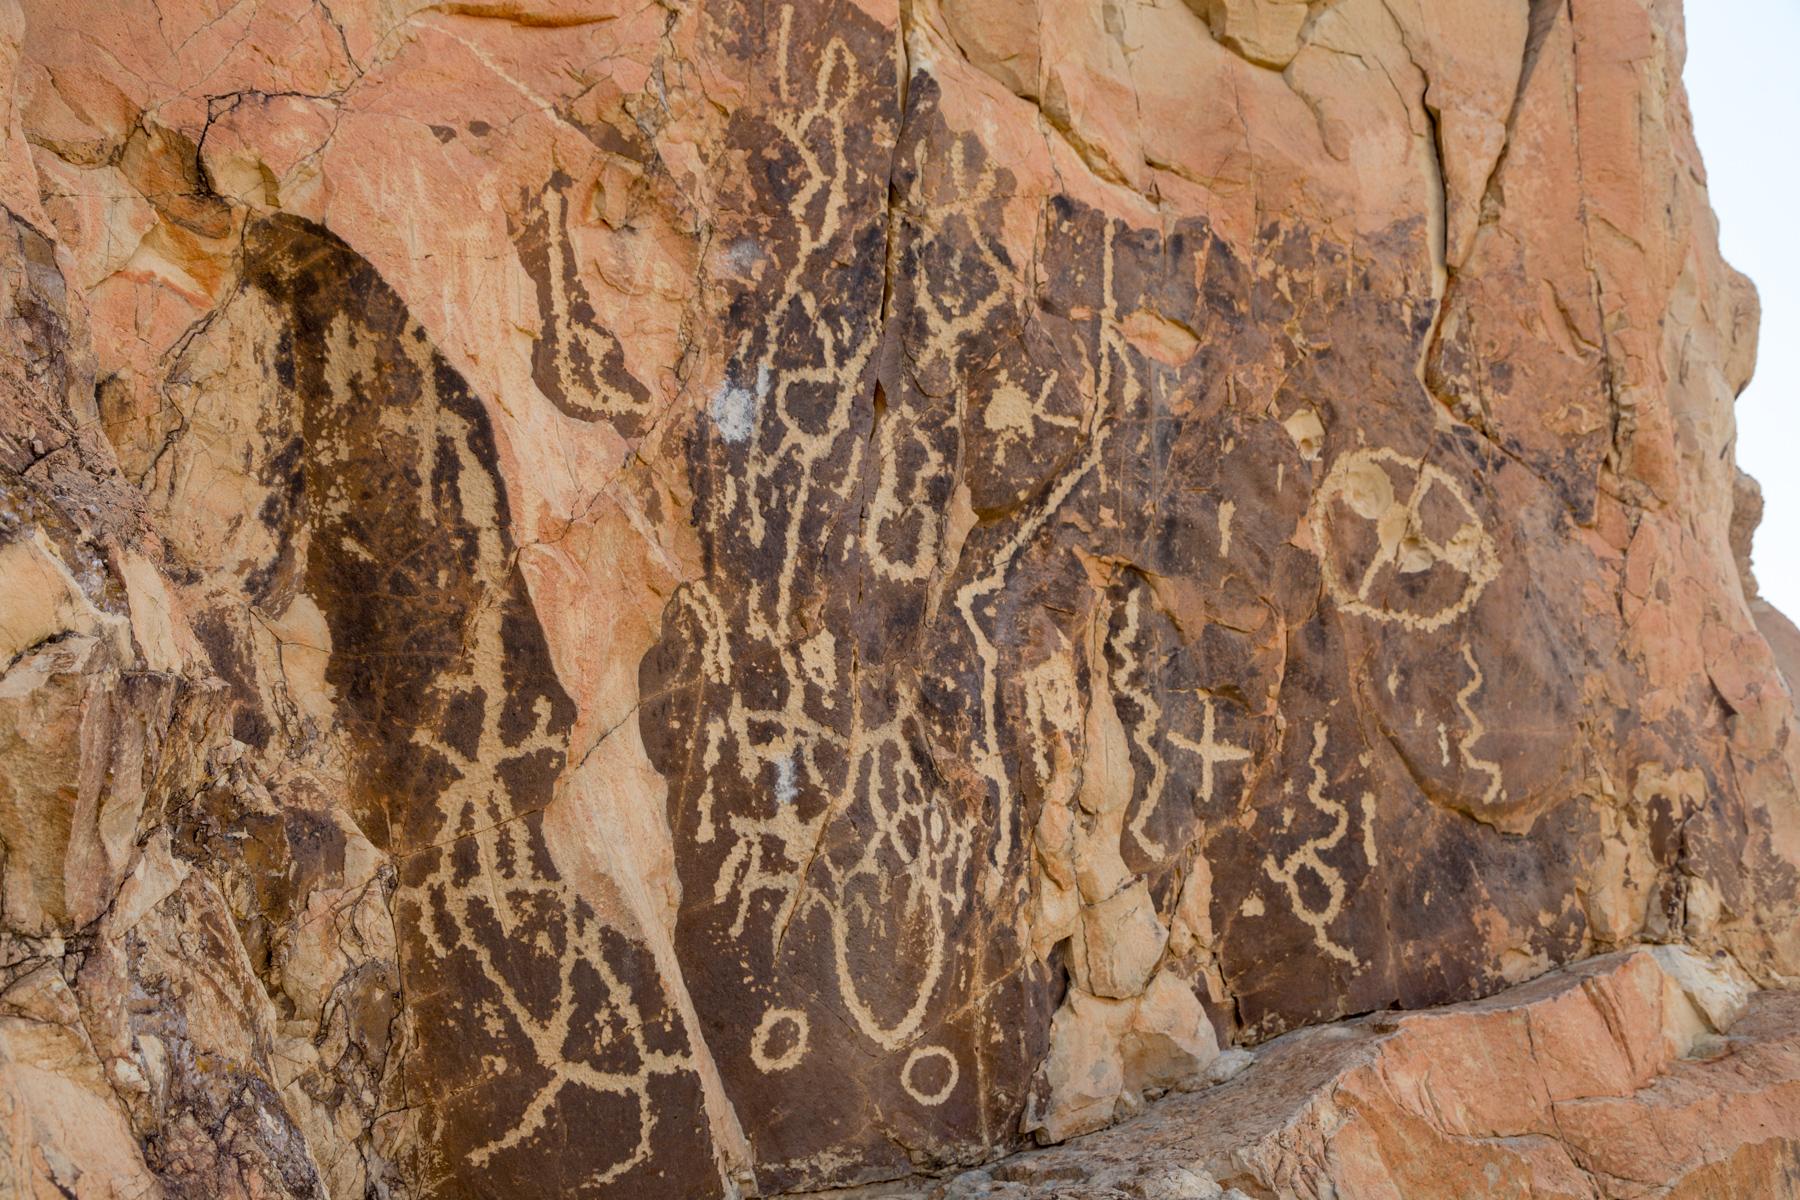 Petroglyphts at The Chimneys (Big Bend National Park)